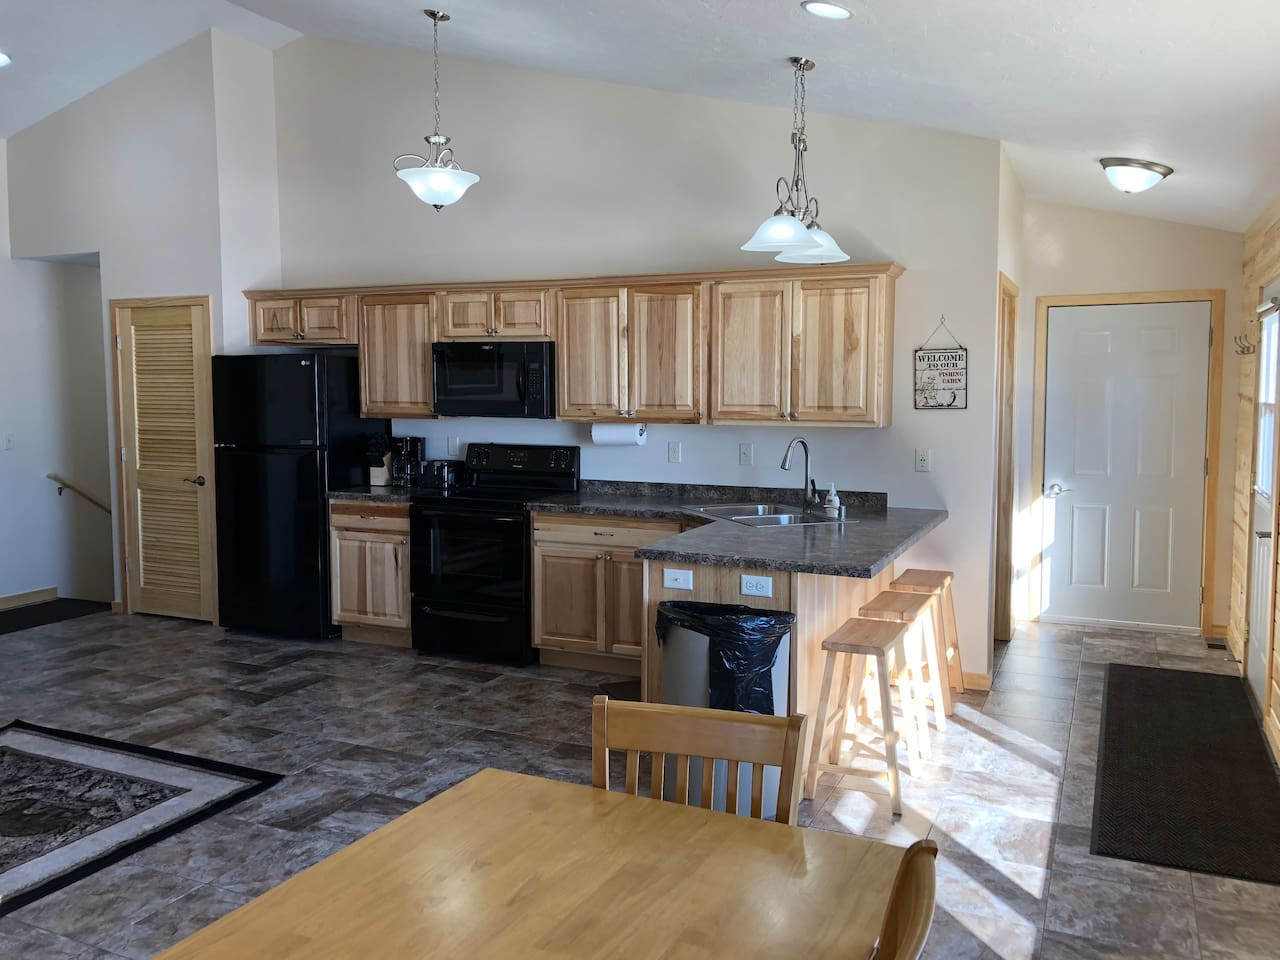 Kitchen & Adjoining door to cabin 13